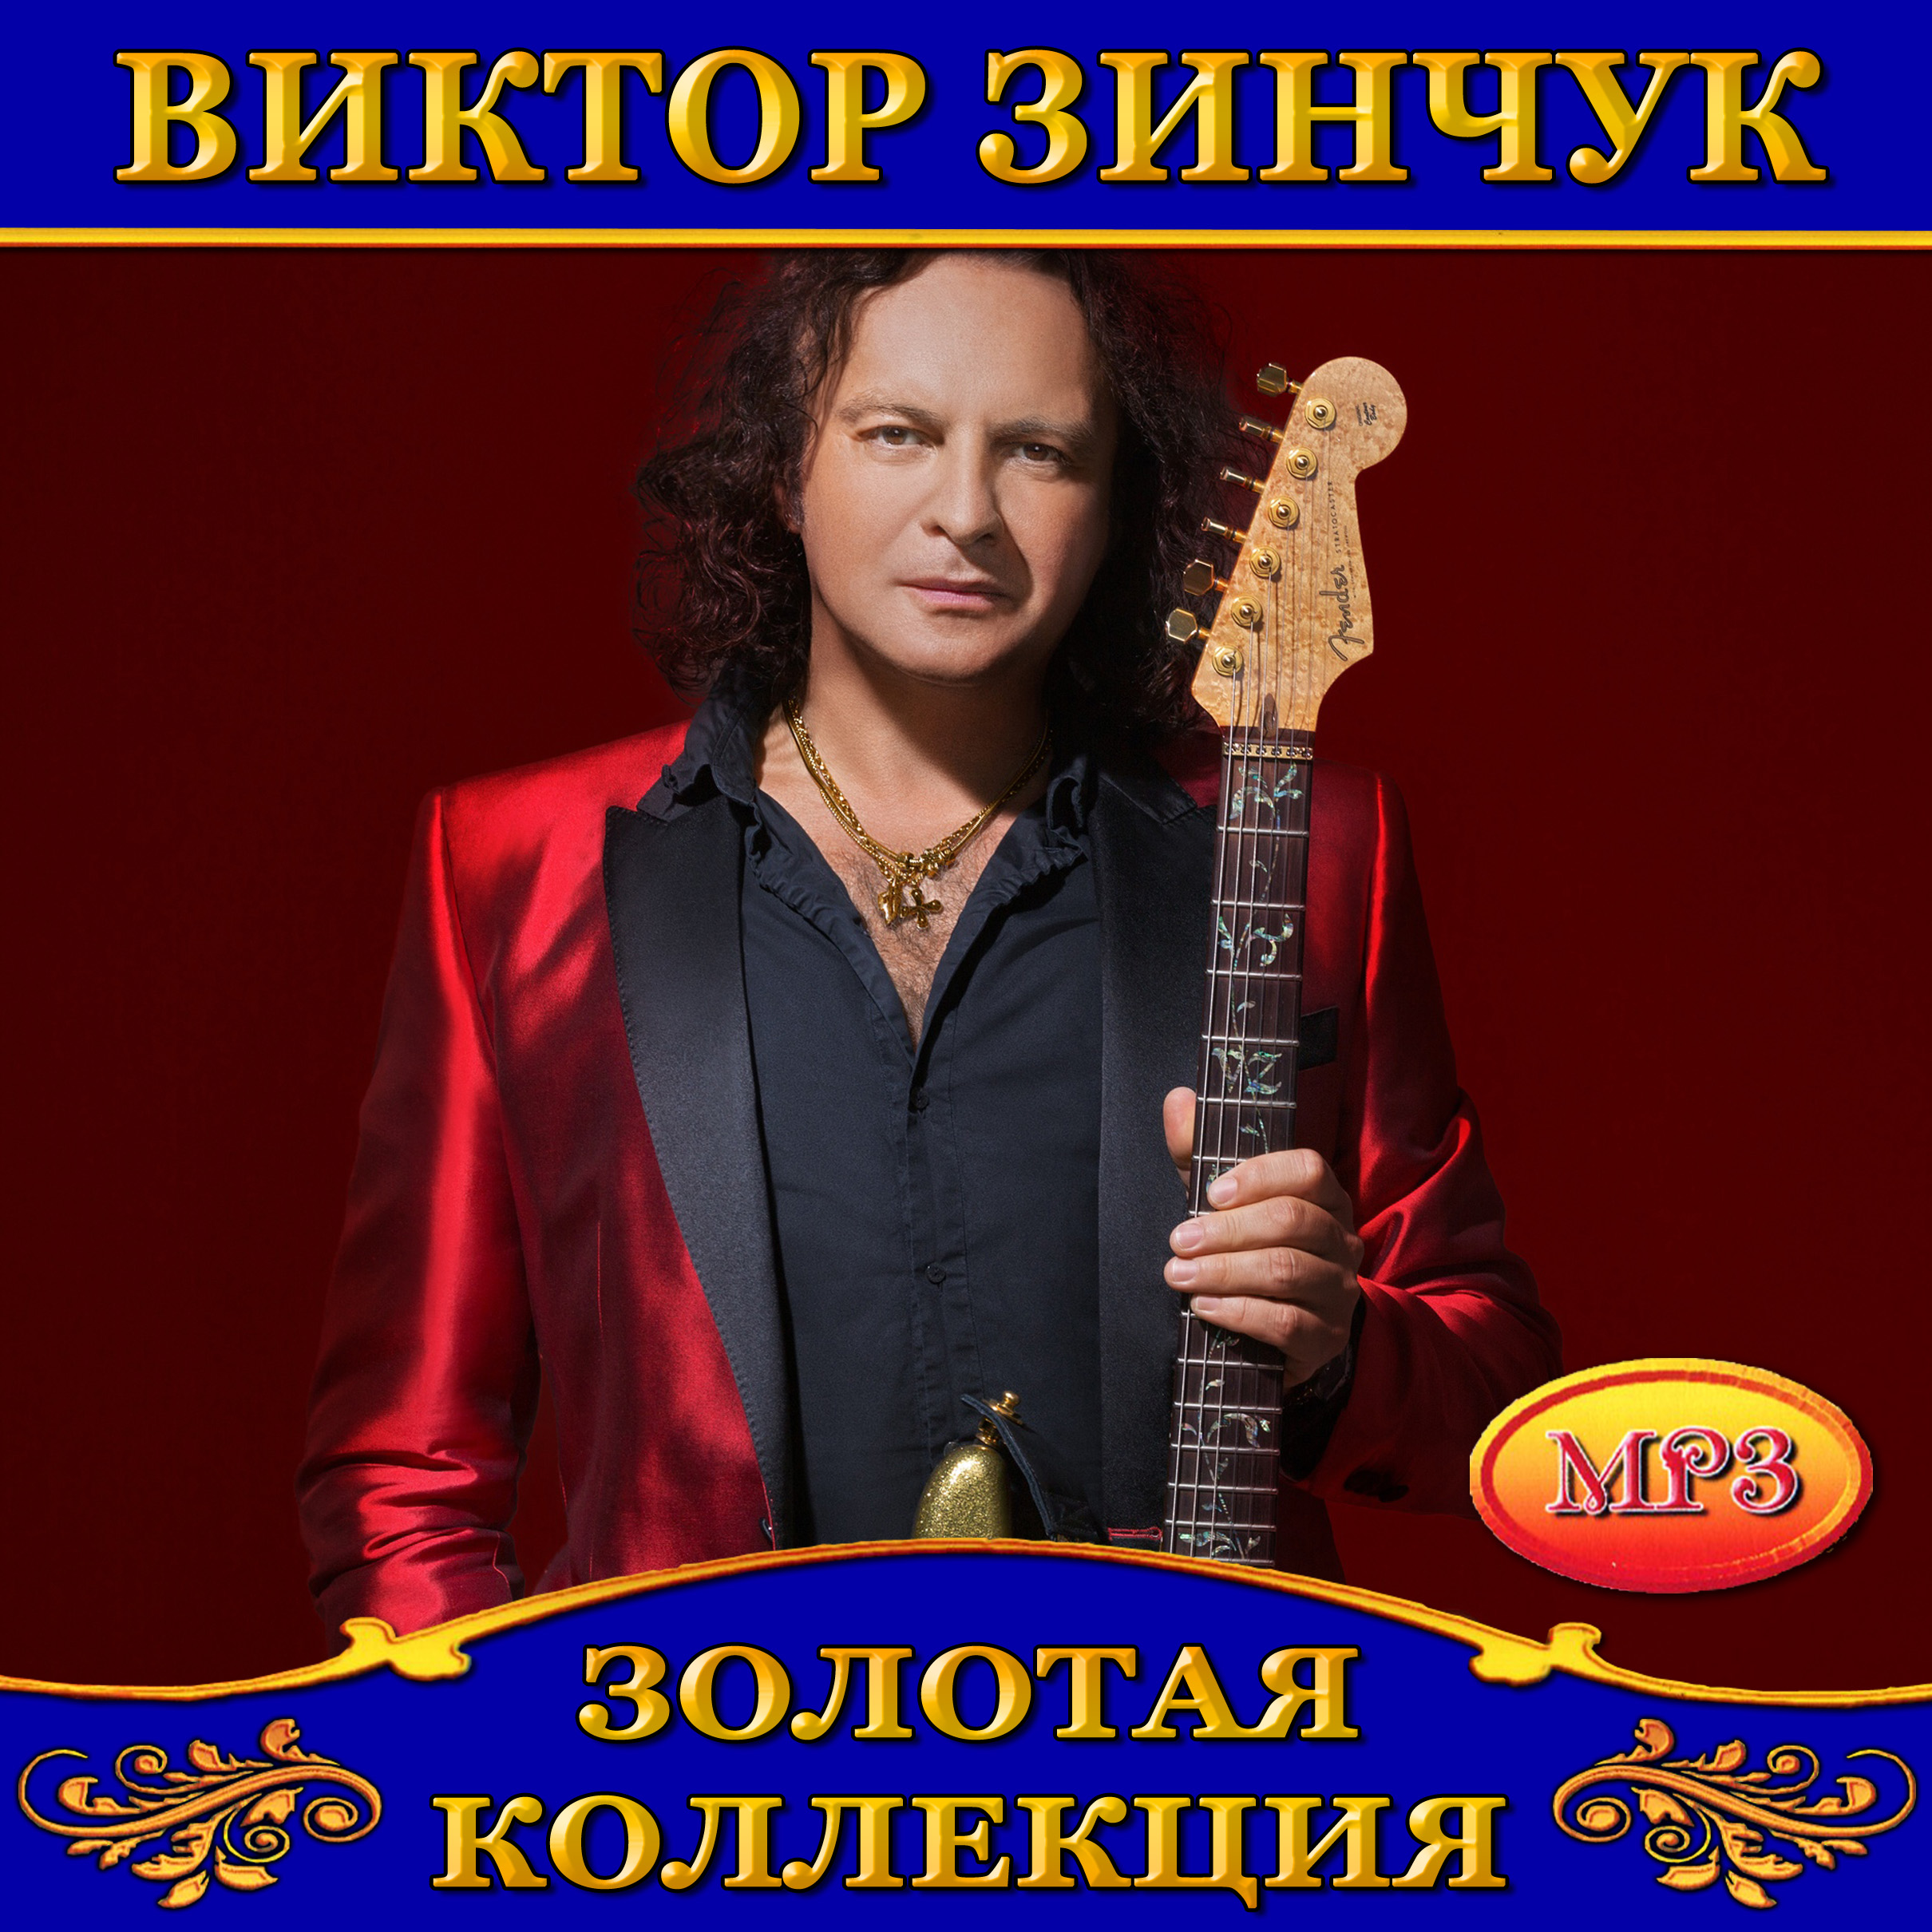 Виктор Зинчук [mp3]